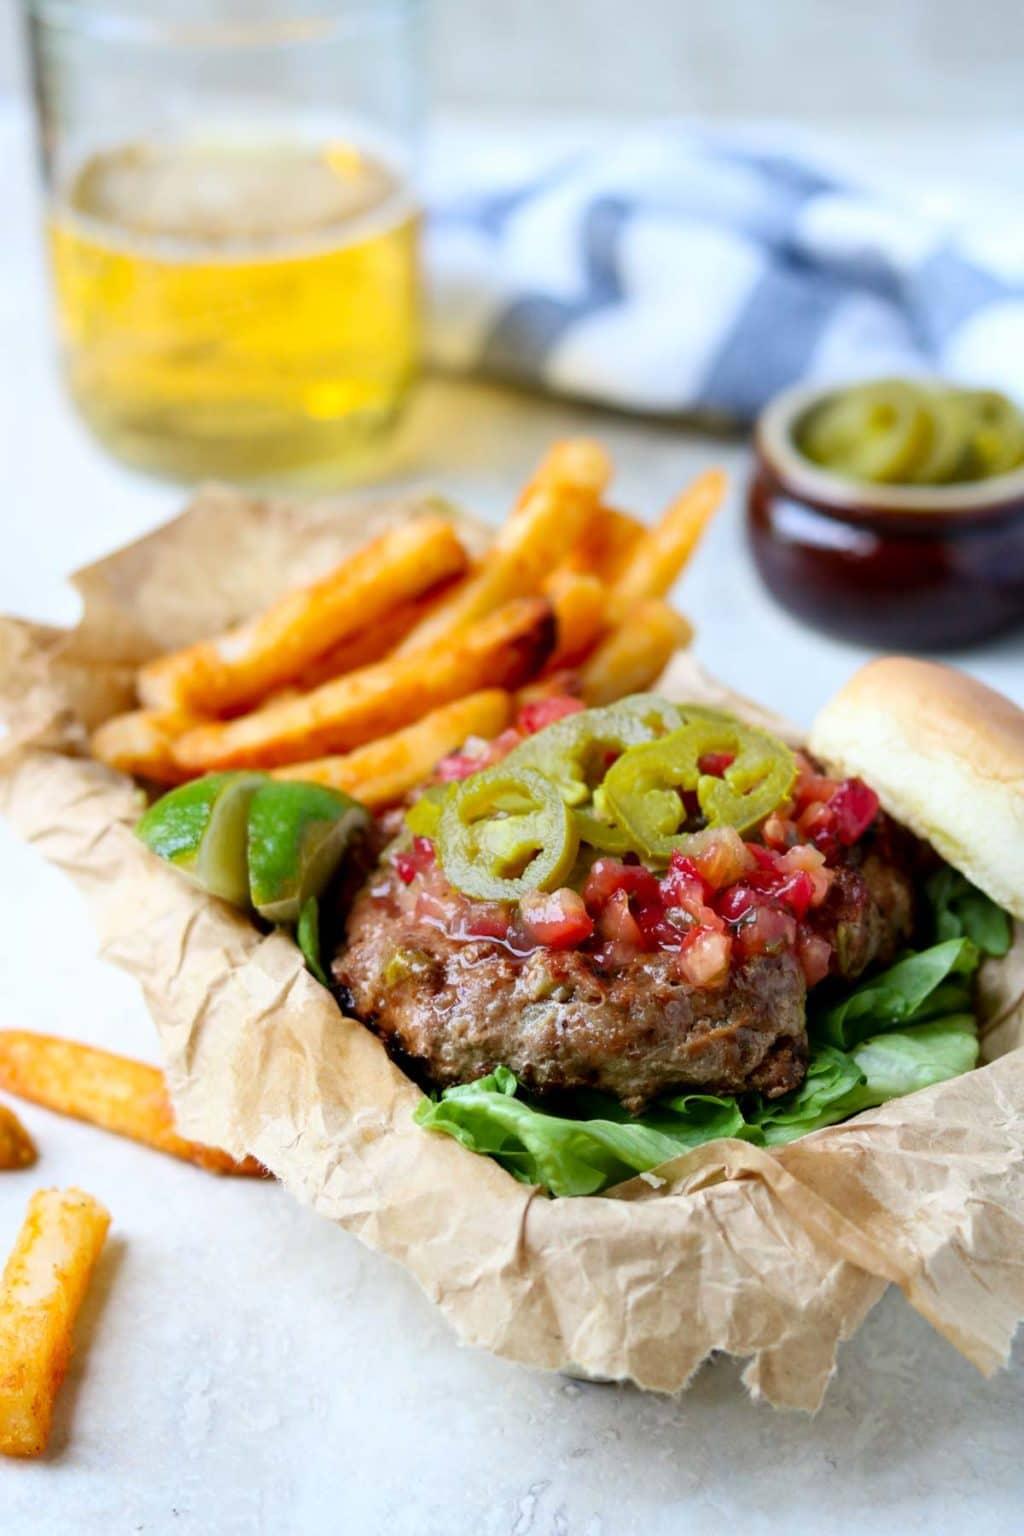 turkey burger with pico de gallo and jalapenos